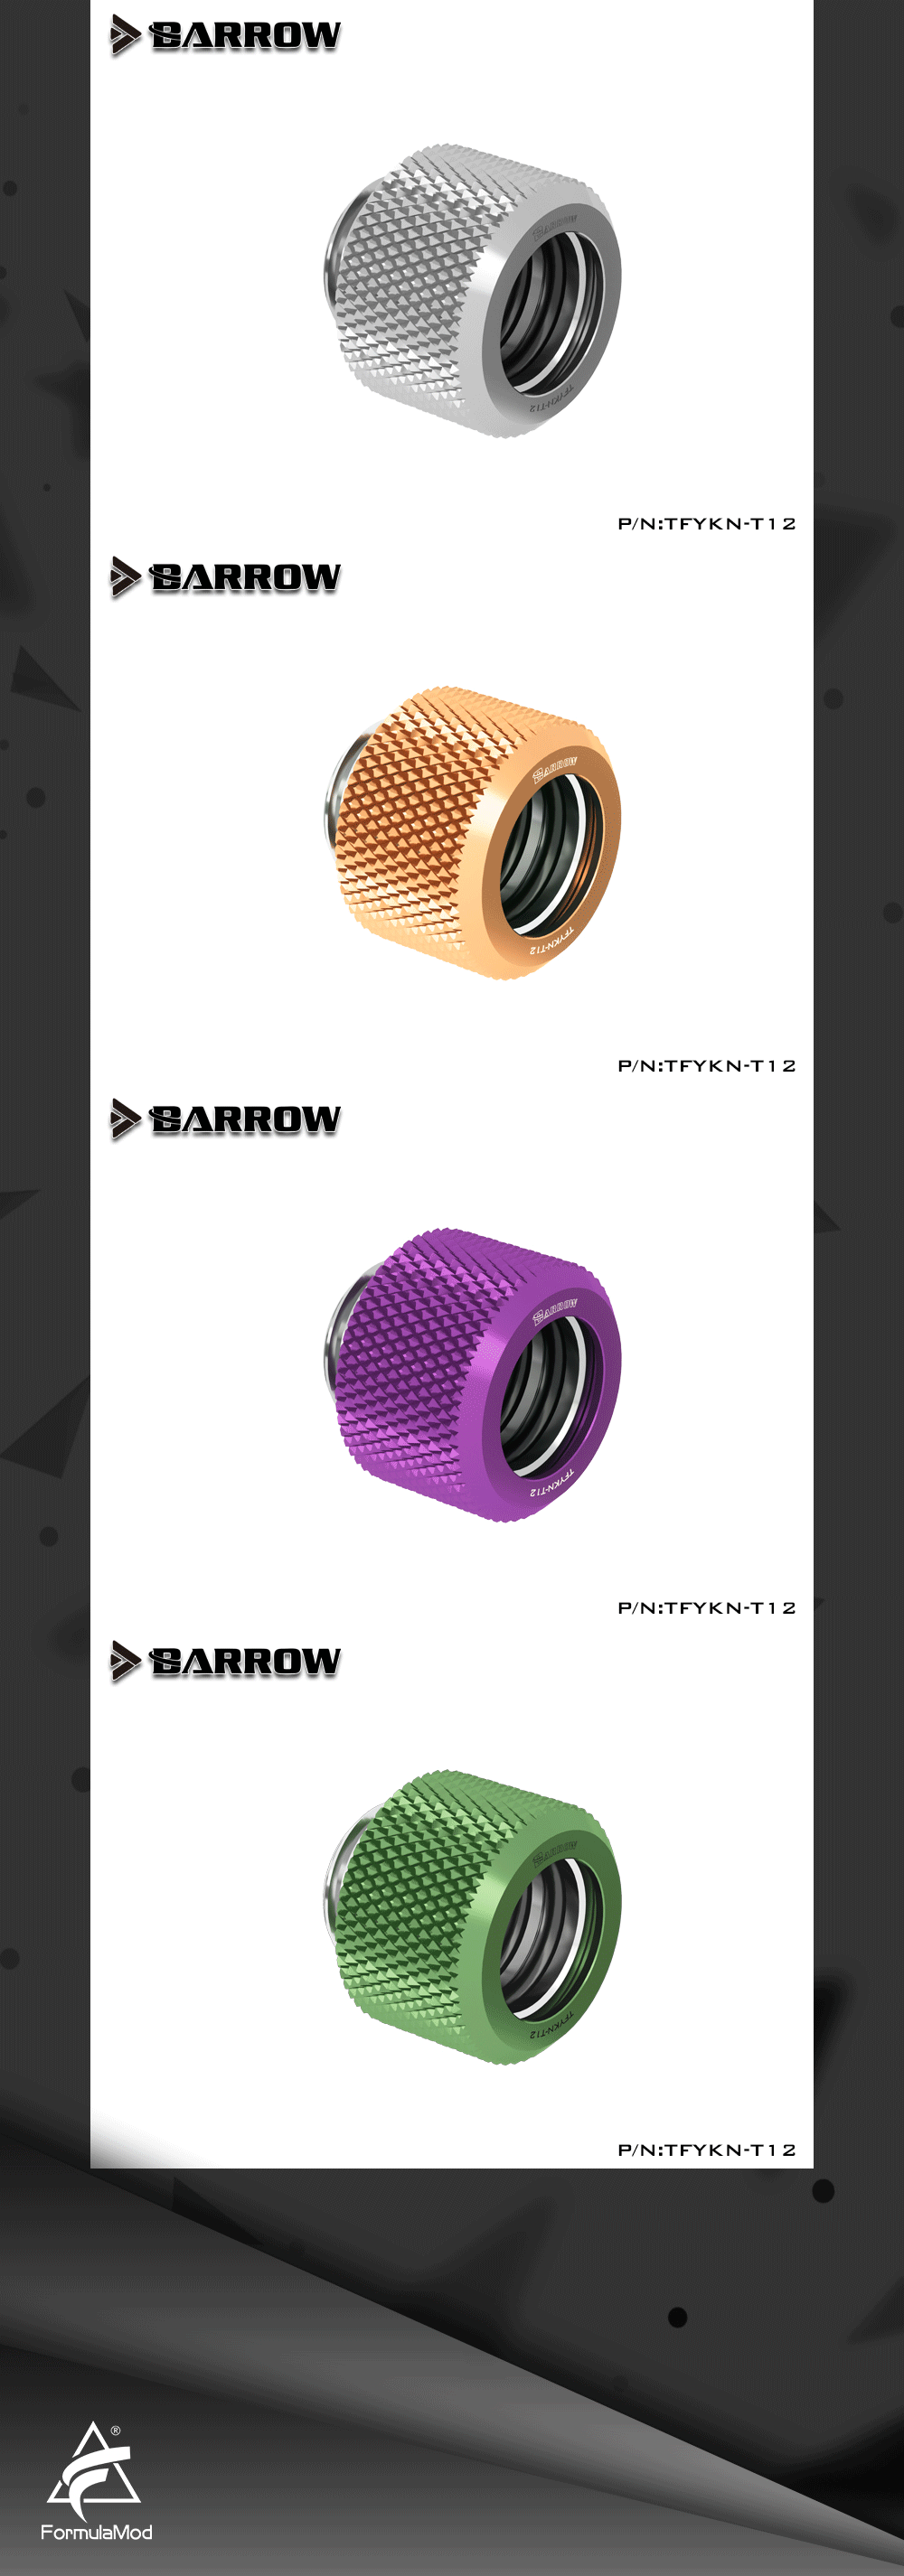 Barrow TFYKN-T12, OD12mm Choice Hard Tube Fittings, G1/4 Adapters For OD12mm Hard Tubes